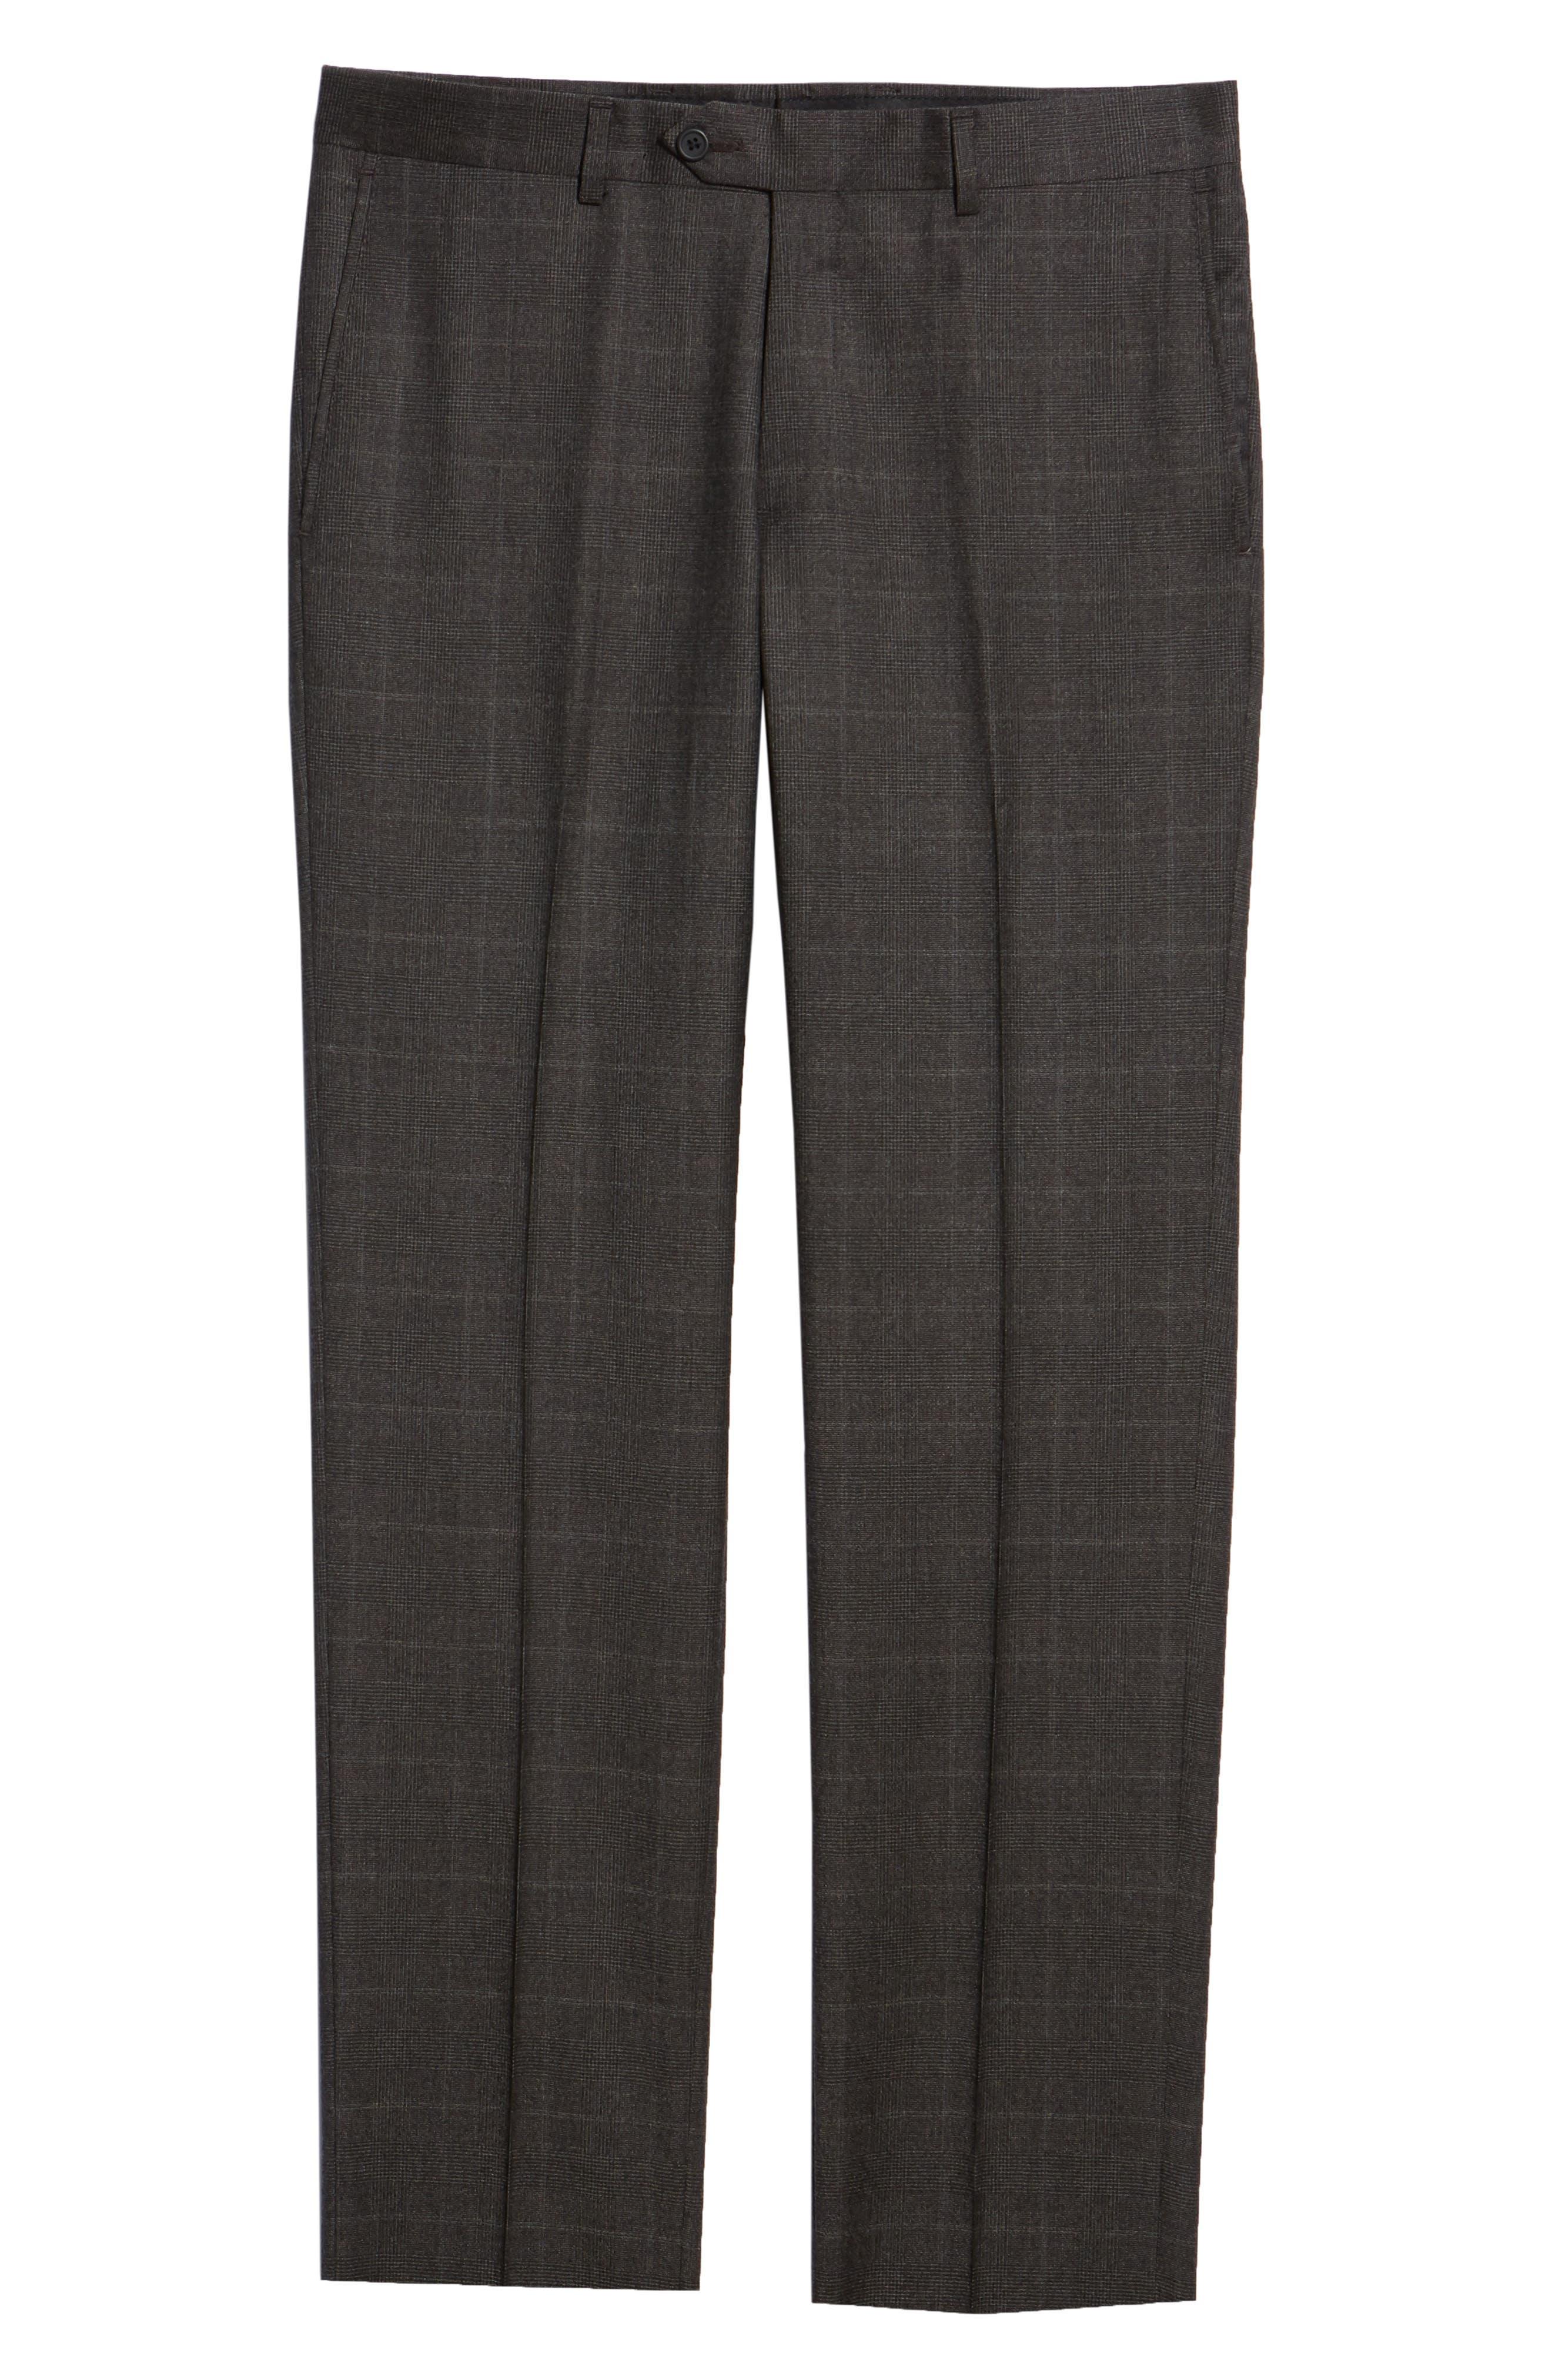 Trim Fit Flat Front Wool Trousers,                             Alternate thumbnail 6, color,                             BLACK